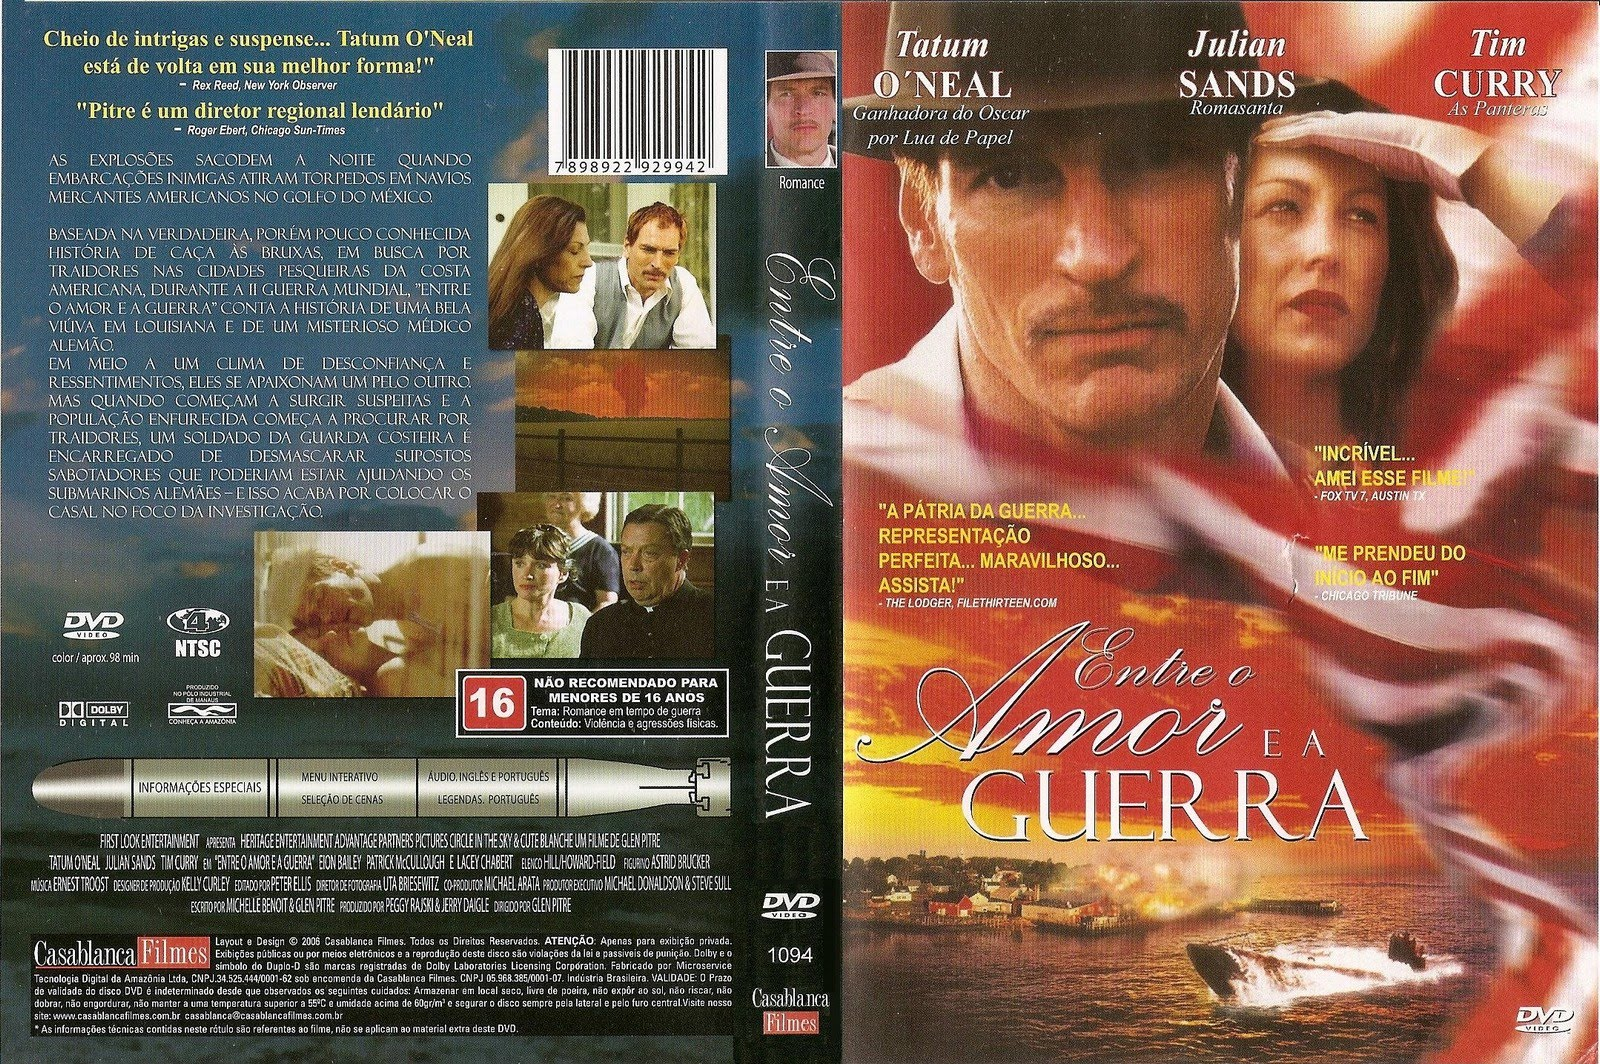 http://2.bp.blogspot.com/-b1tgJ78tdHU/TWuuZqeivzI/AAAAAAAAAX4/bOhxPyoGDXw/s1600/Entre-O-Amor-E-A-Guerra.jpg